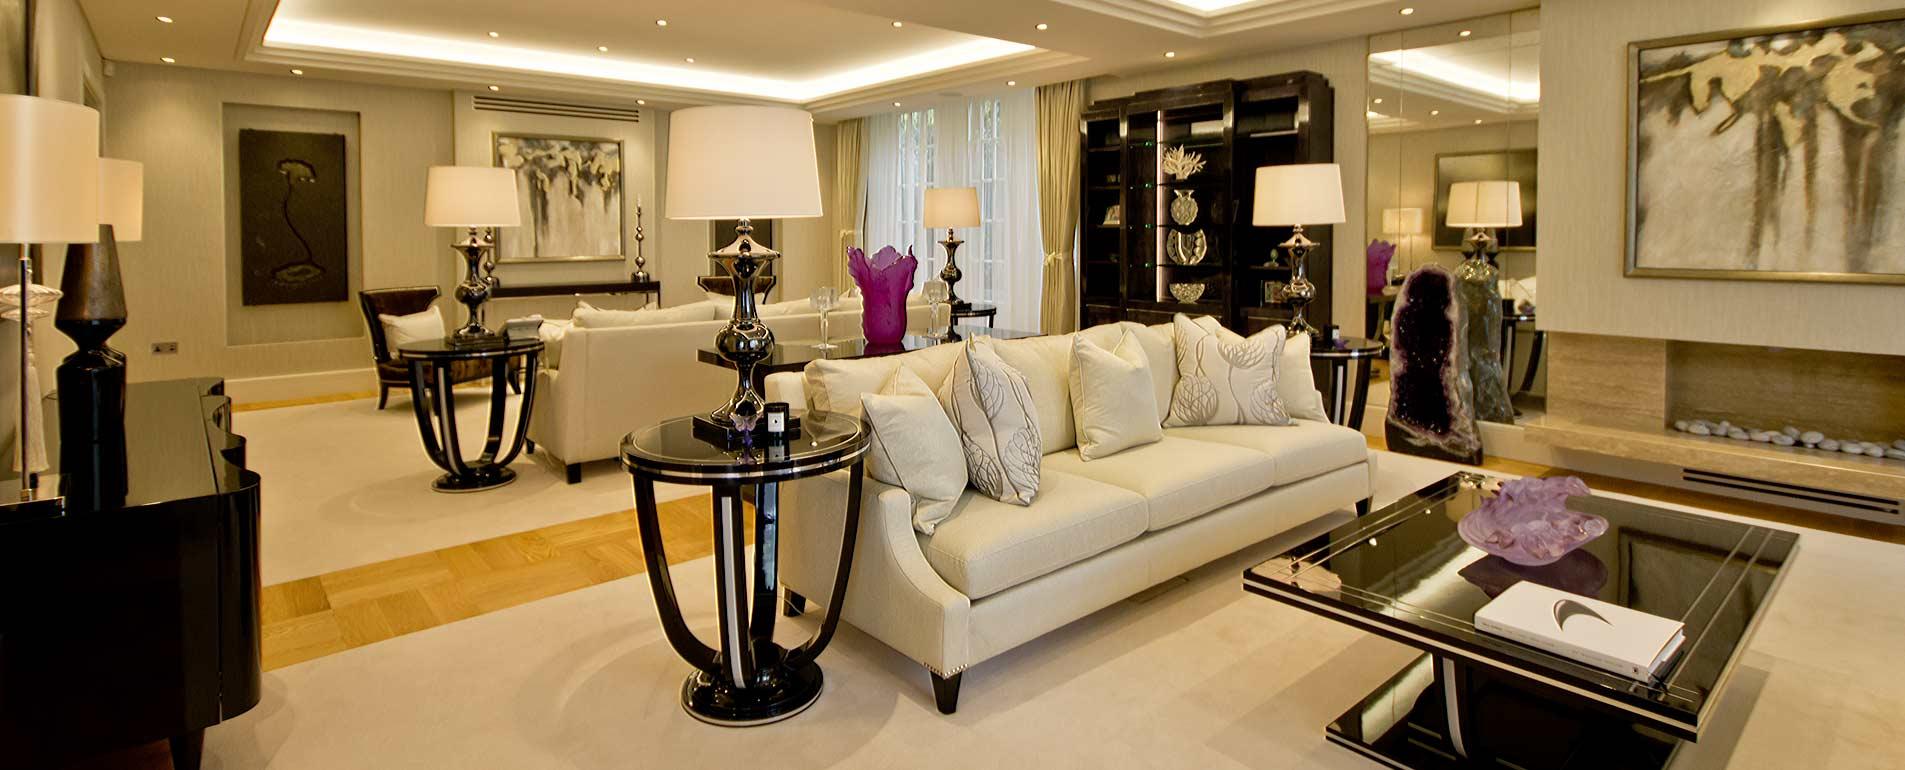 lounge luxury residential refurbishment